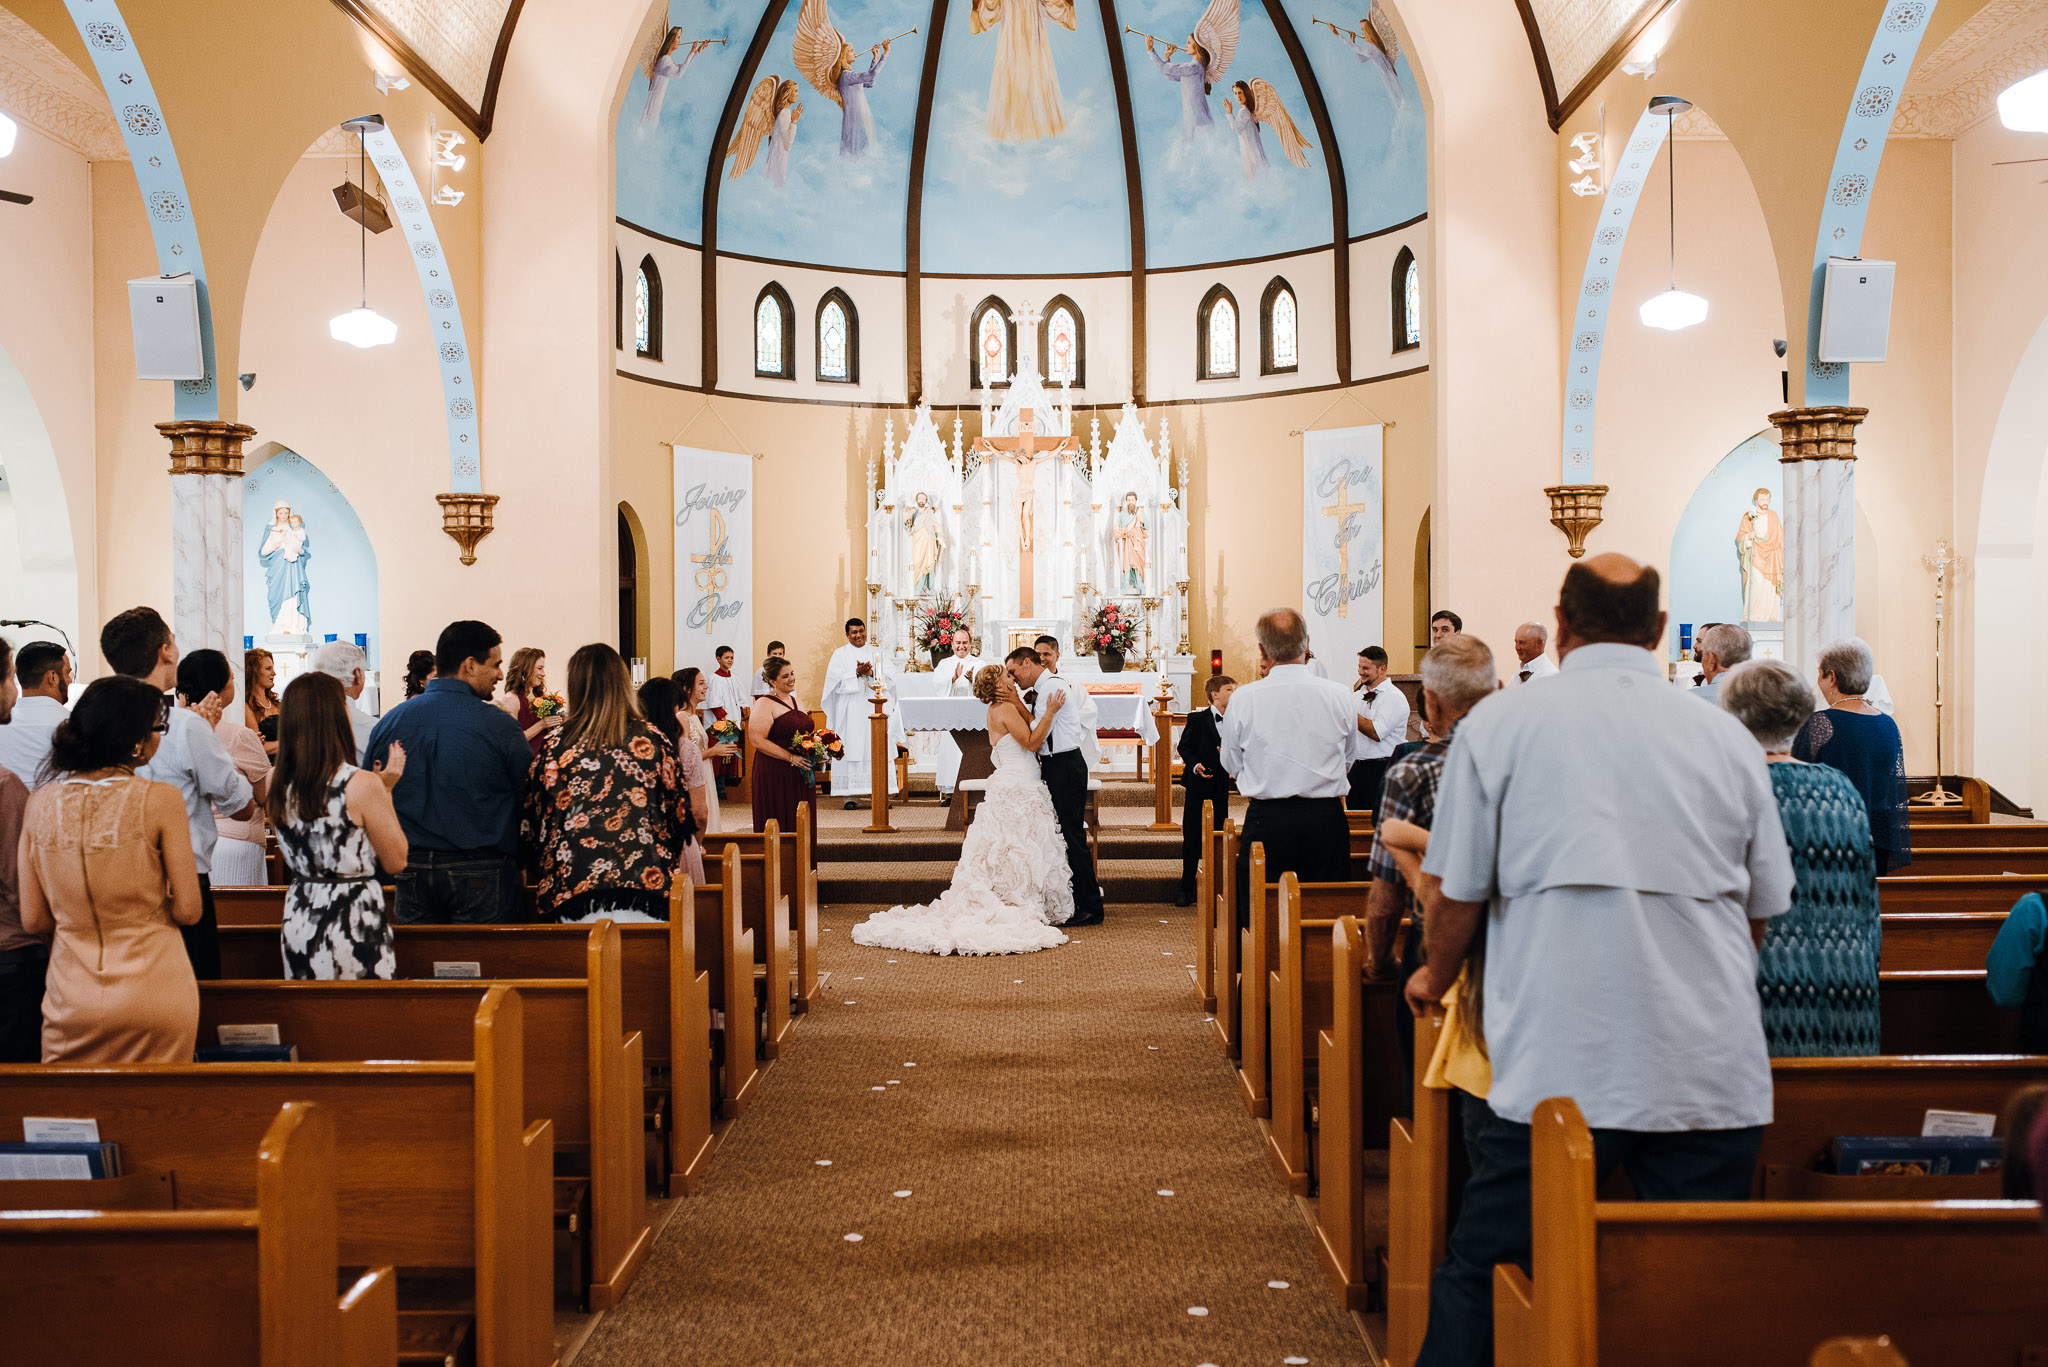 Rowena-West-Texas-Wedding-Photographer-Gillian&Ryan-0025.jpg